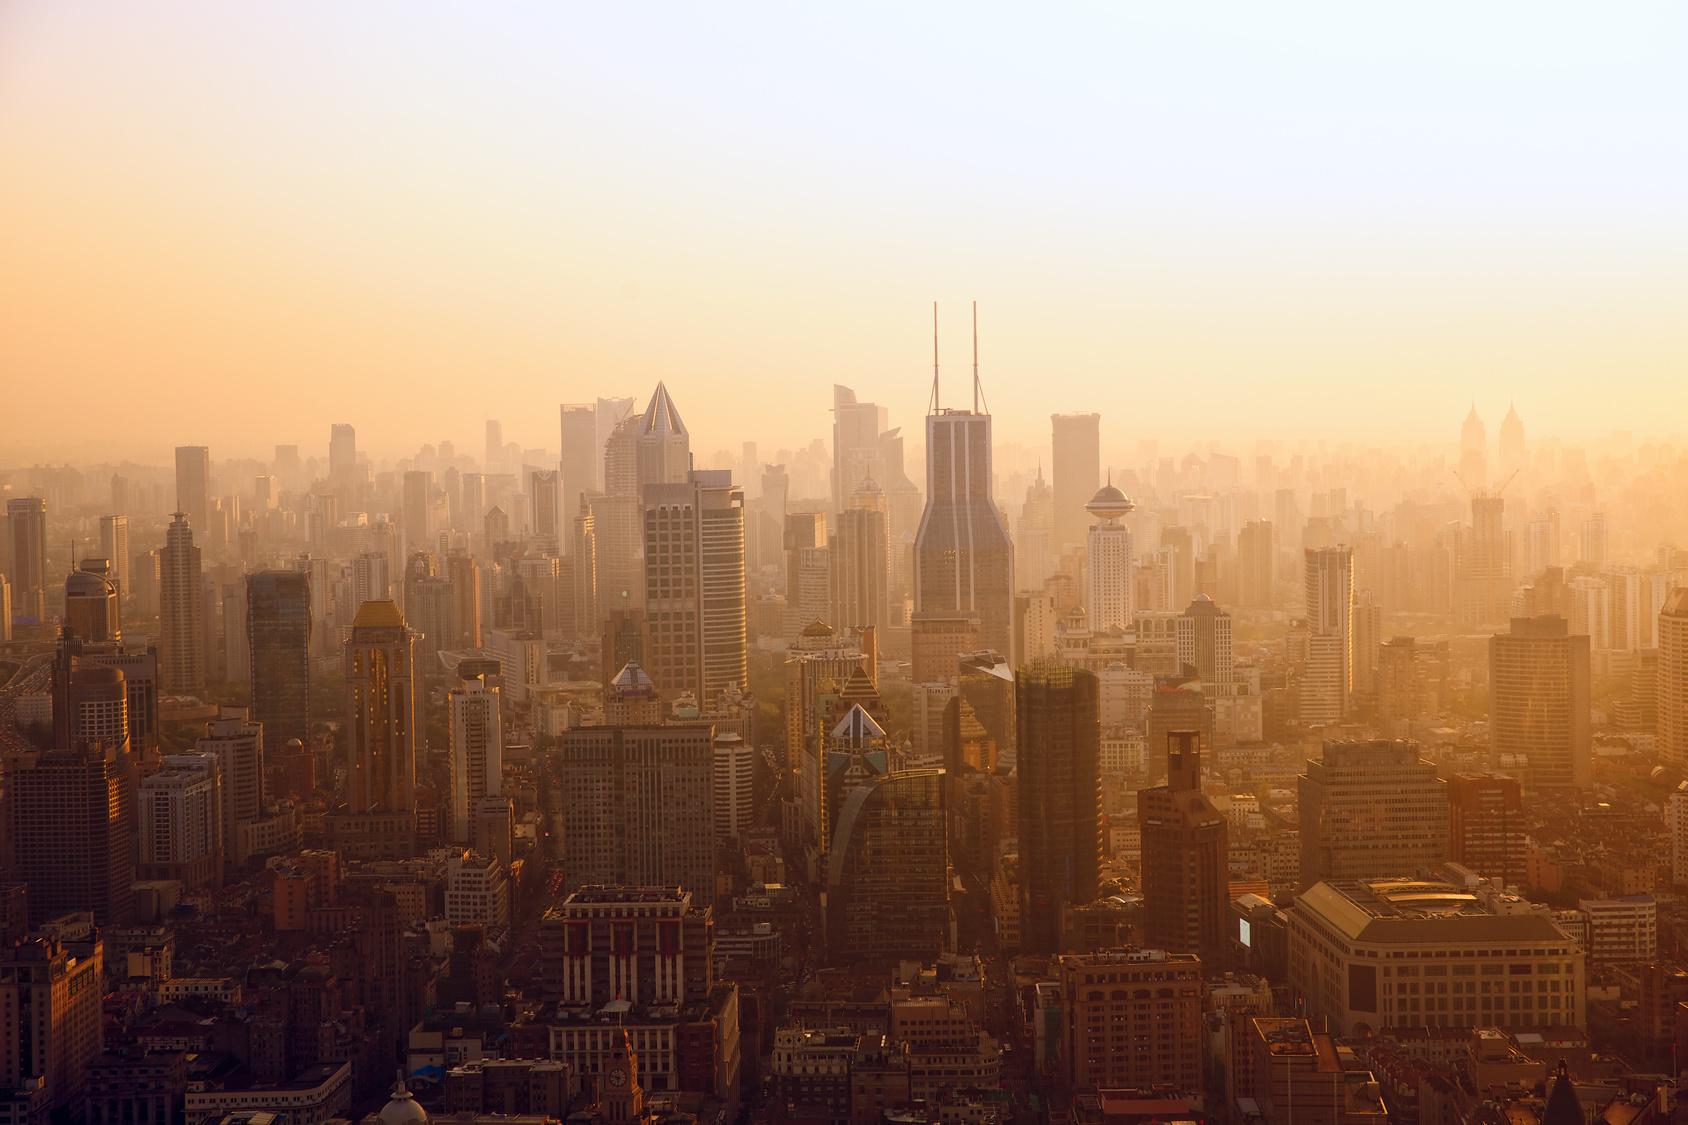 Smog bei Sonnenaufgang in Shanghai